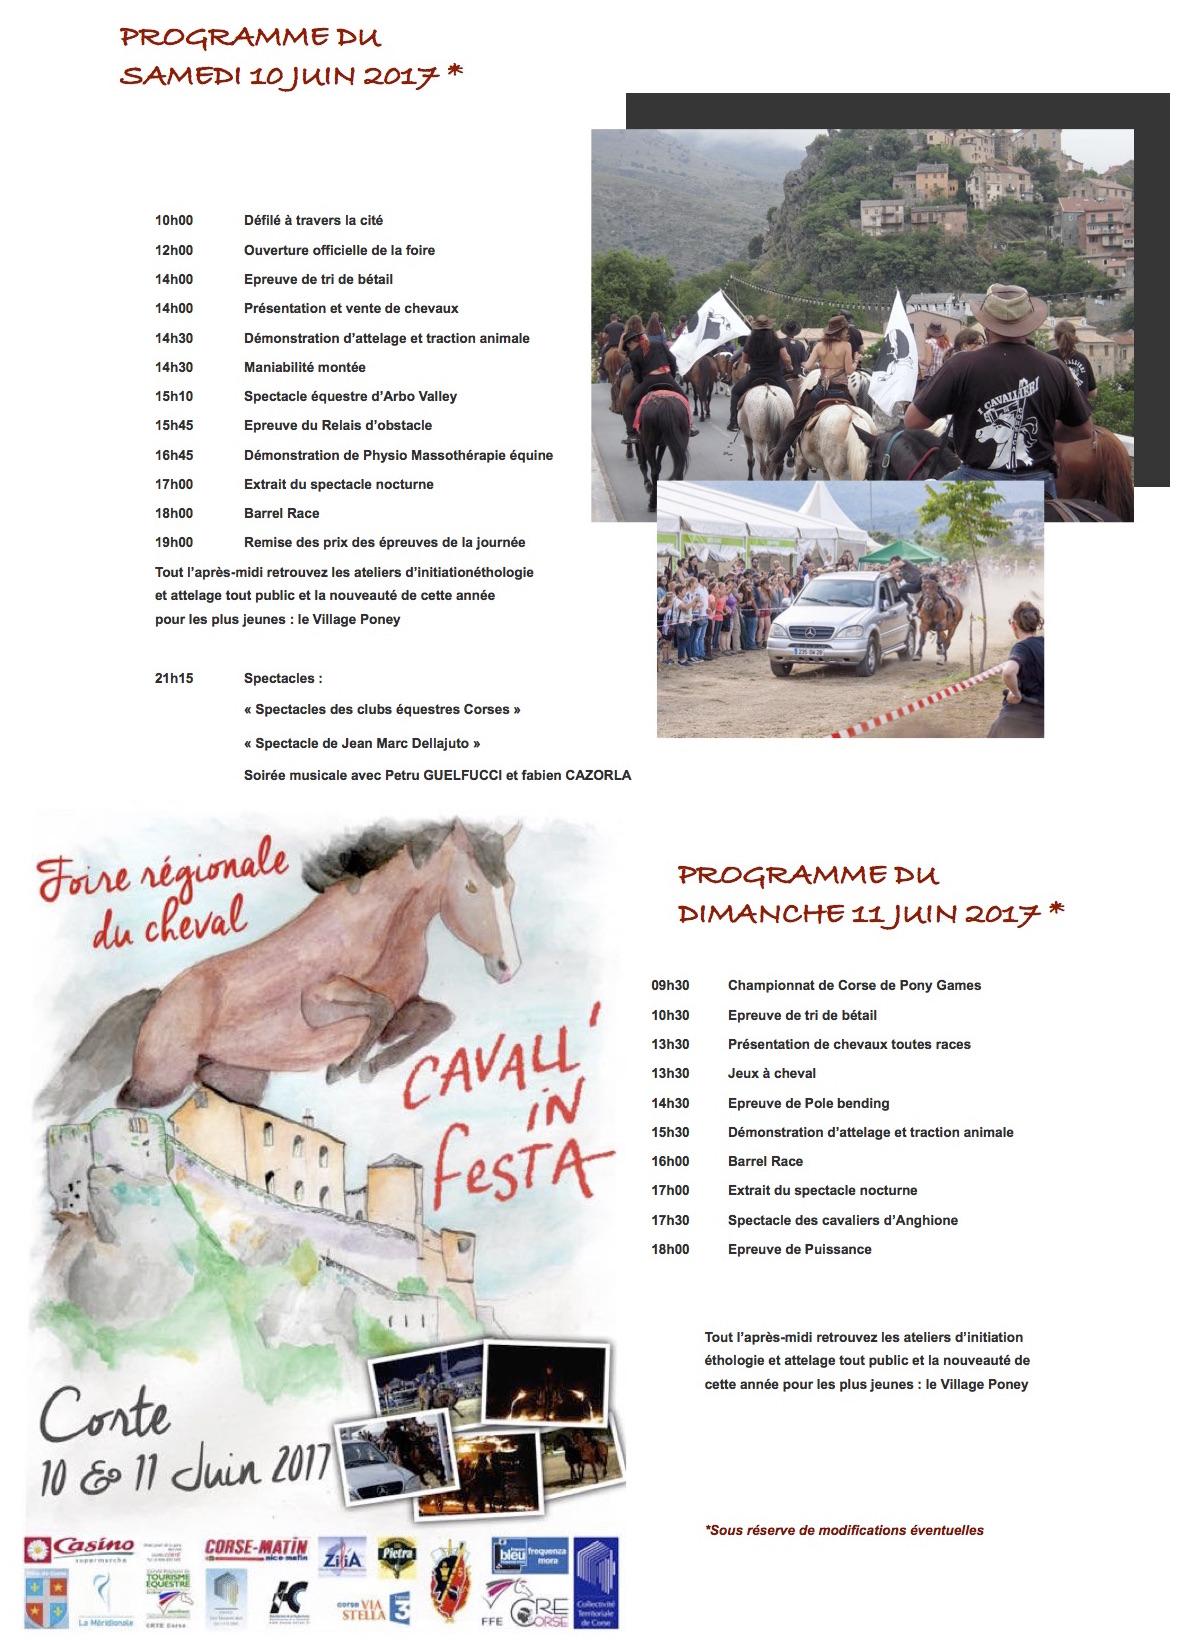 Cavall'in Festa 2017